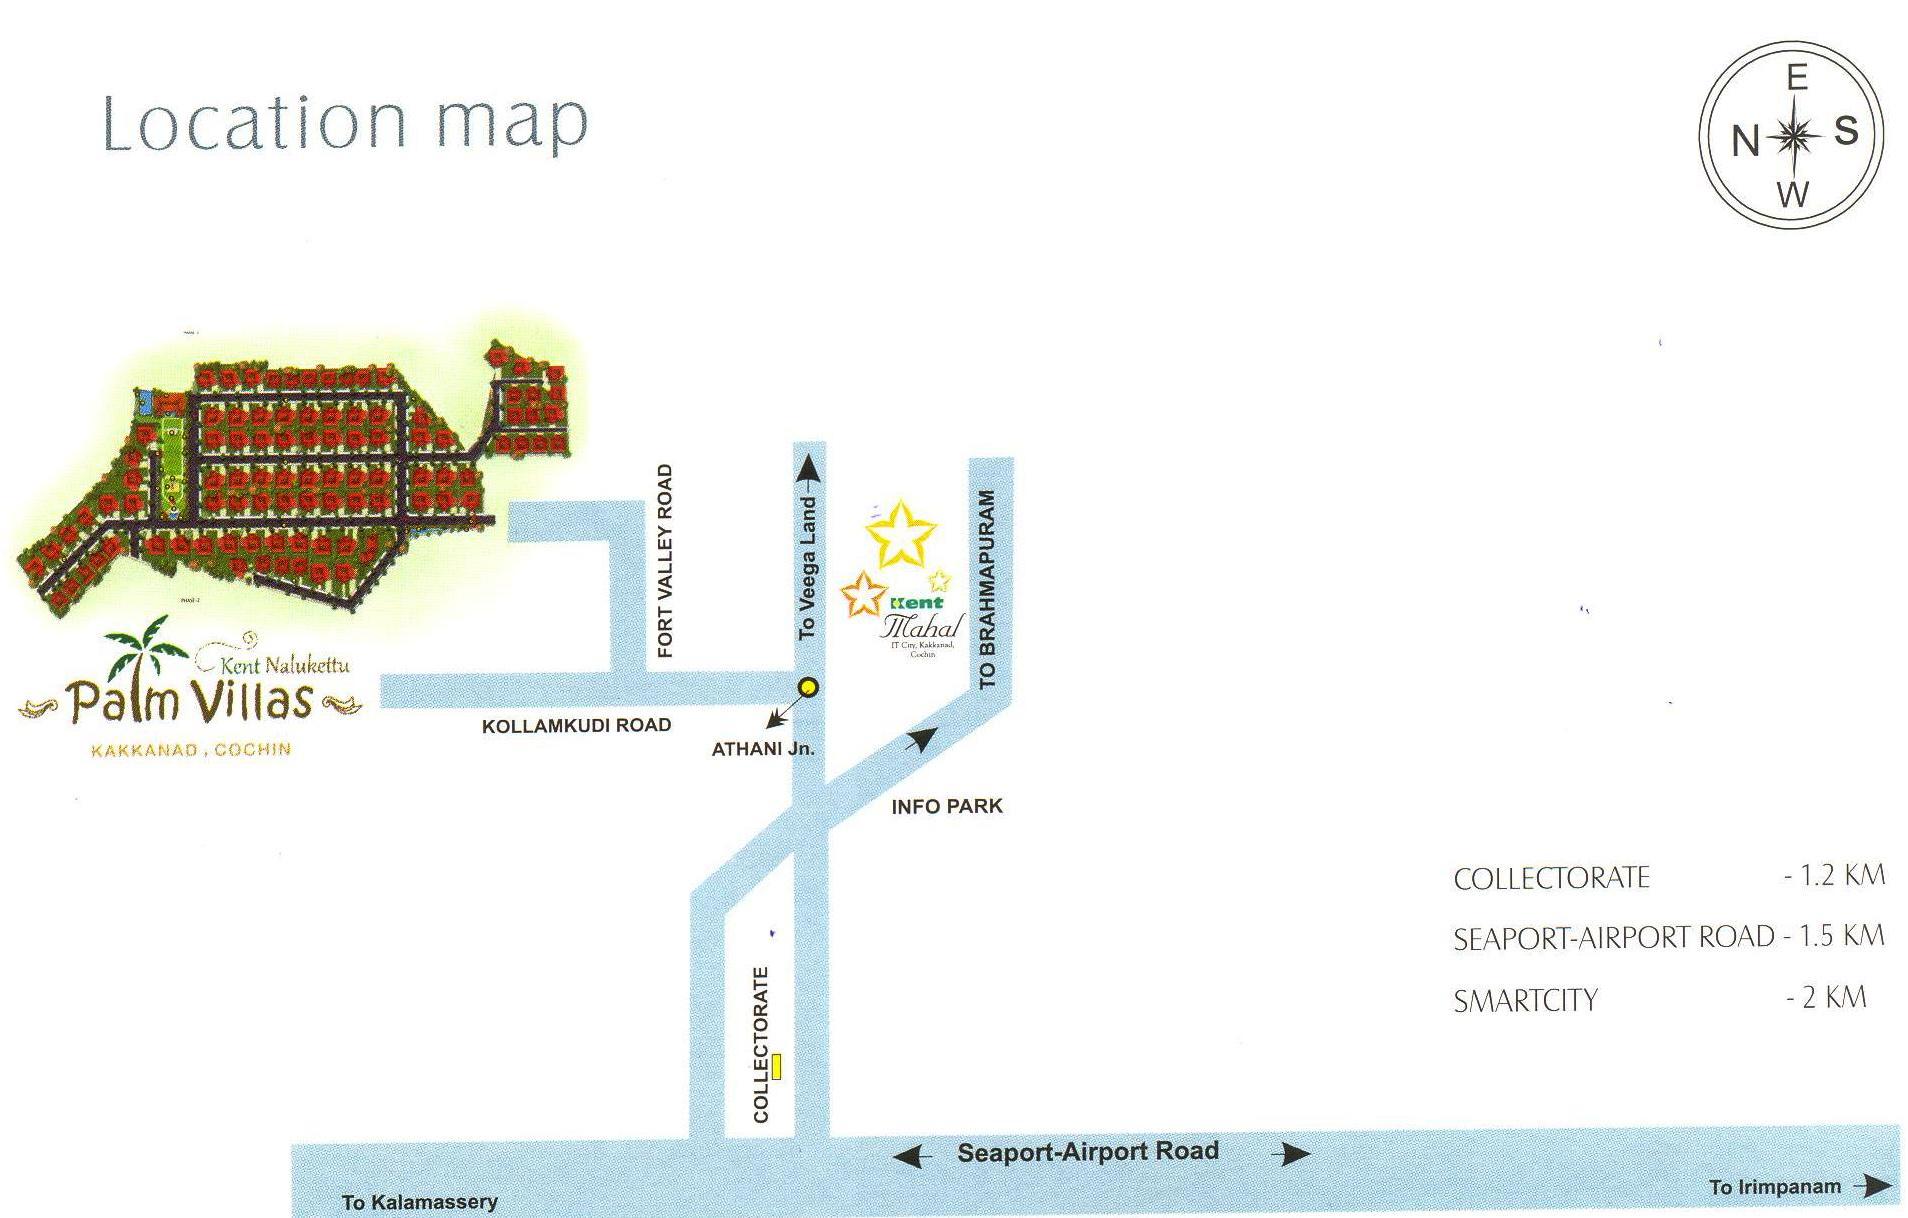 Kent Nalukettu Palm Villas in Kakkanad, Kochi - Price, Location Map ...